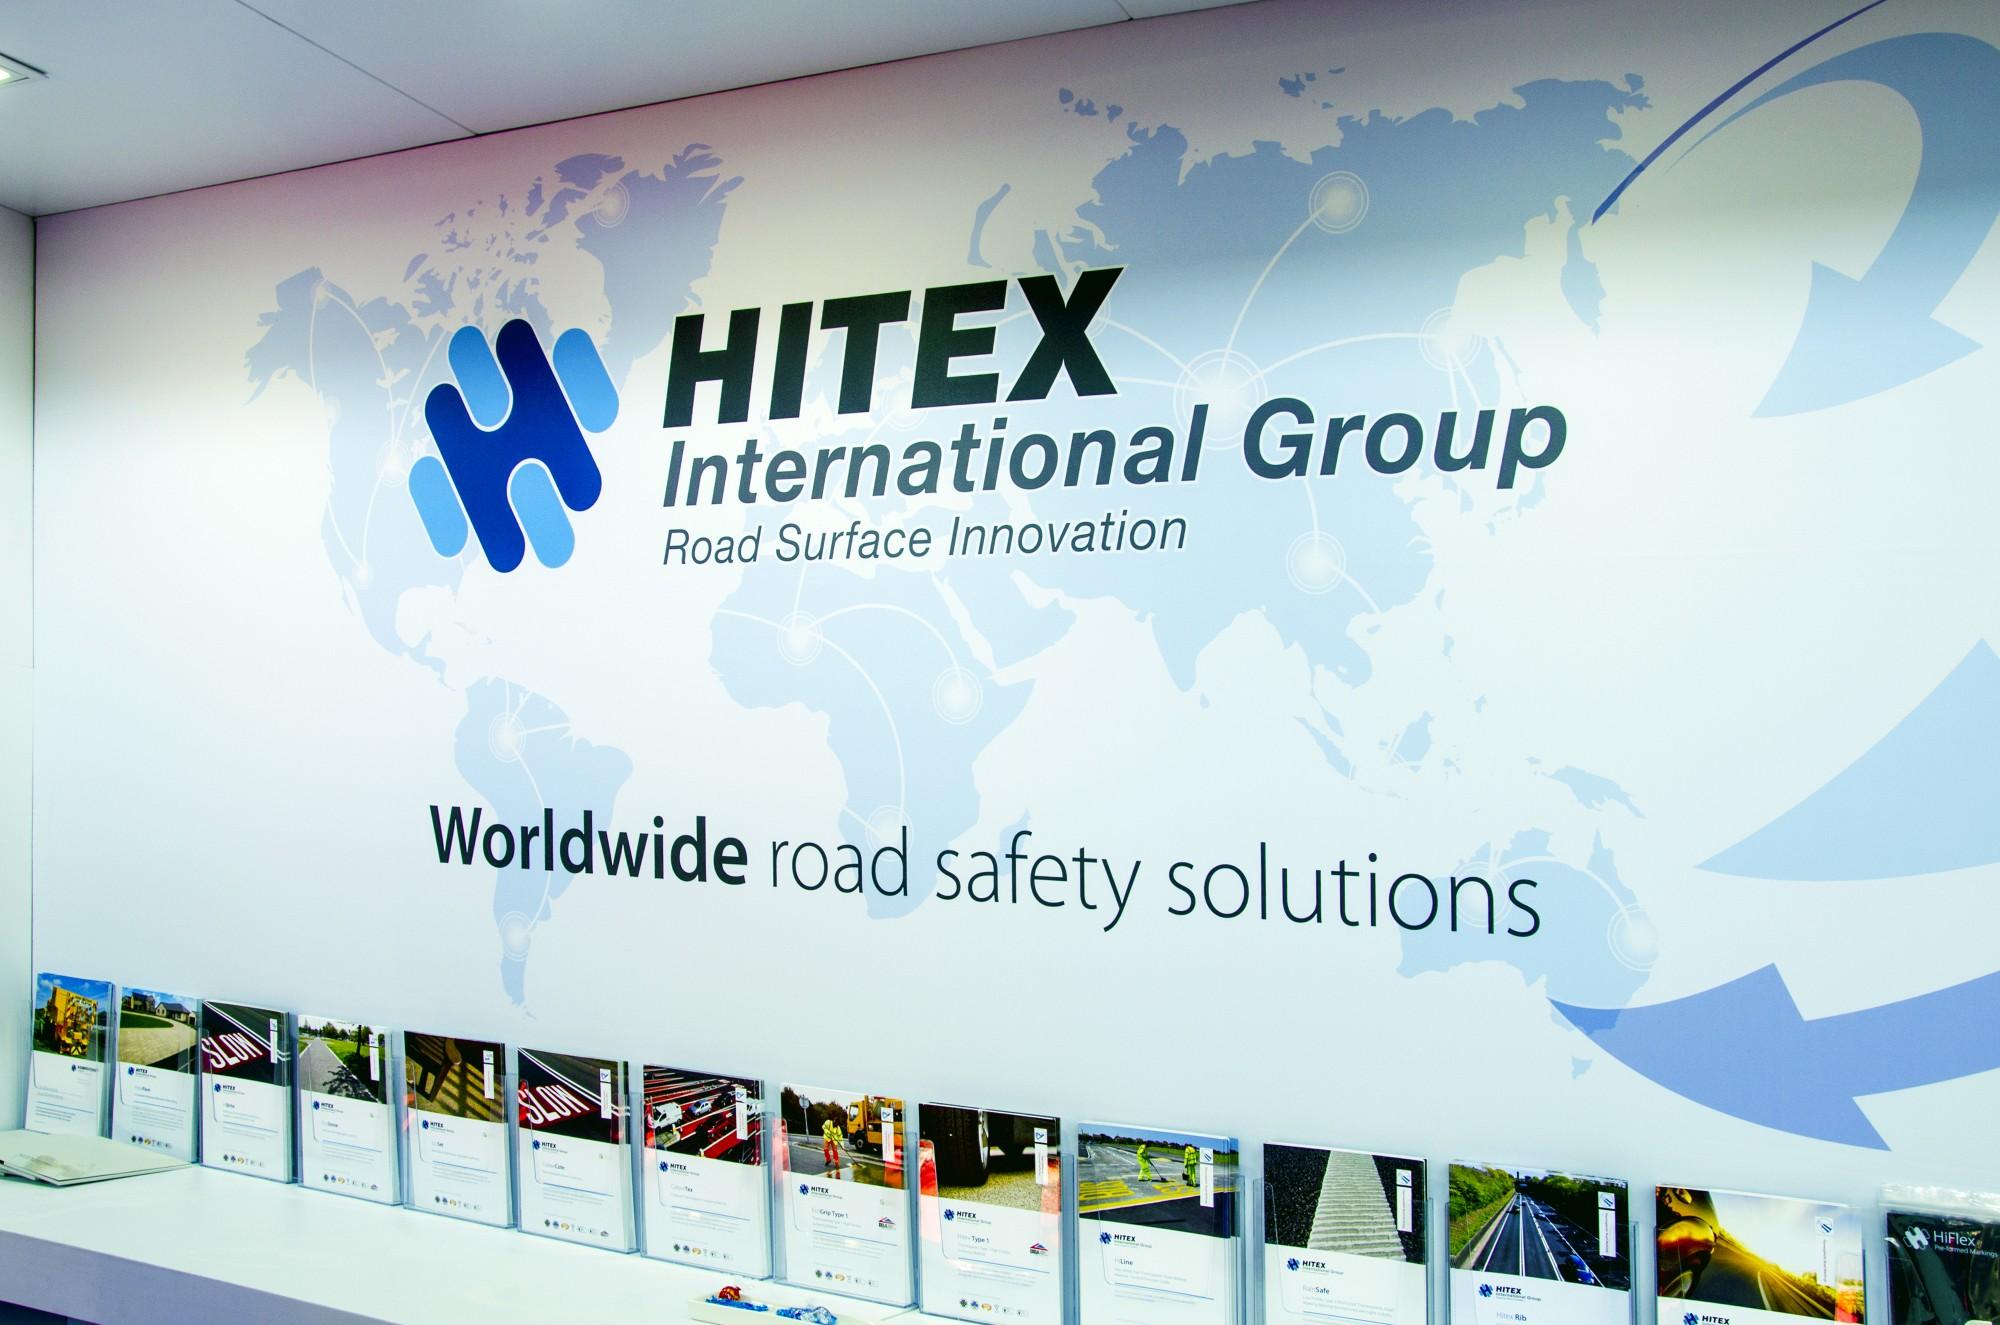 Hitex at Intertraffic 2018 23